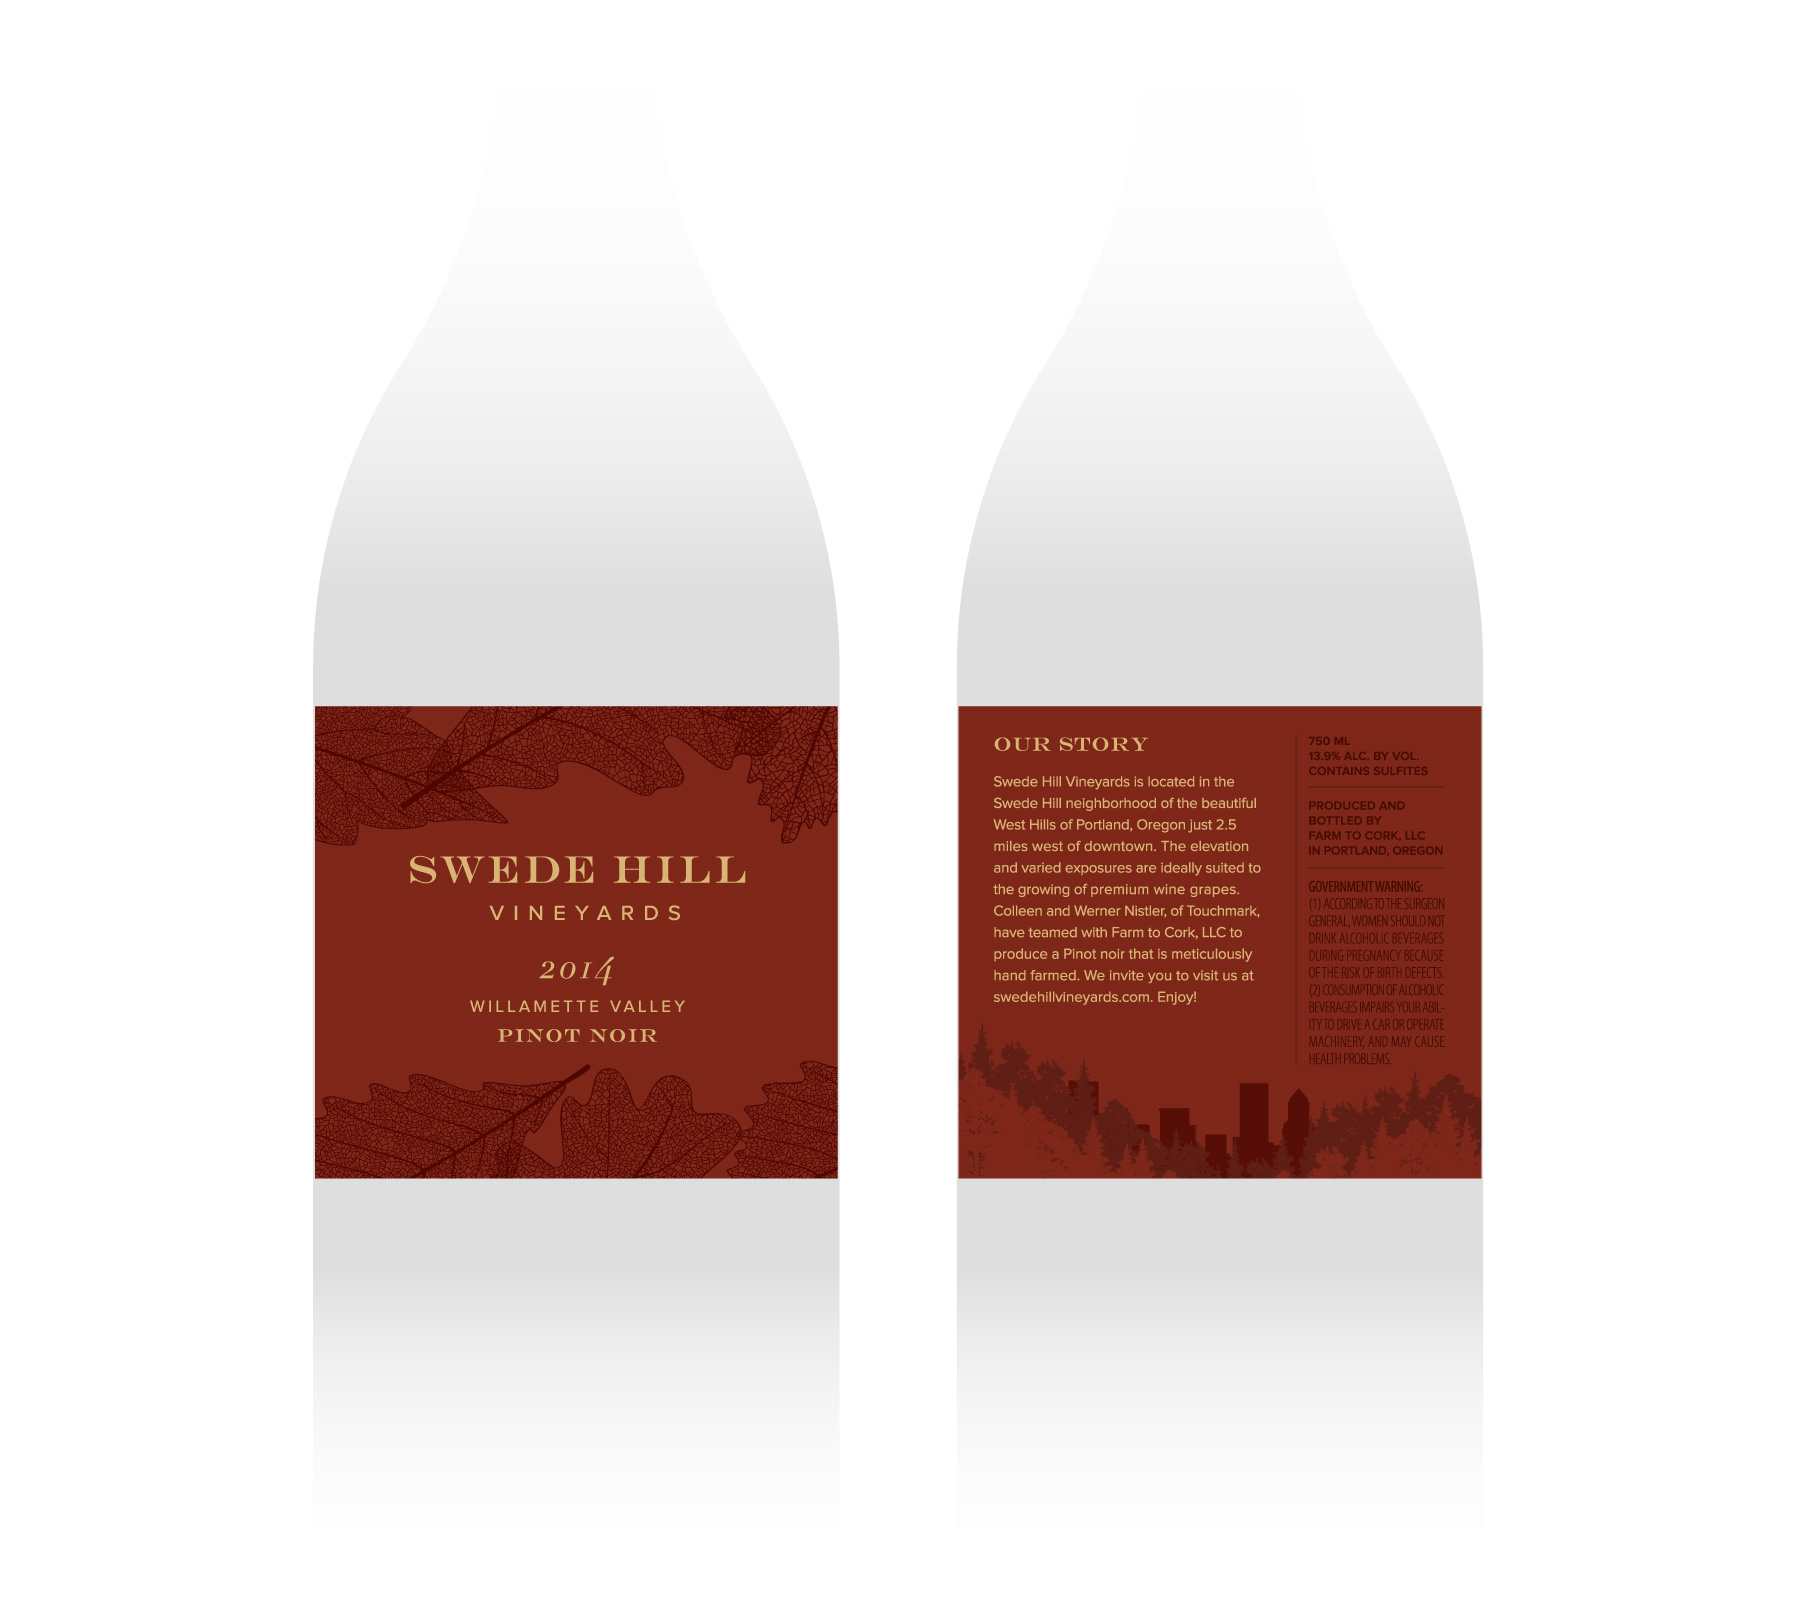 Swede-Hill-Selected-Label.jpg